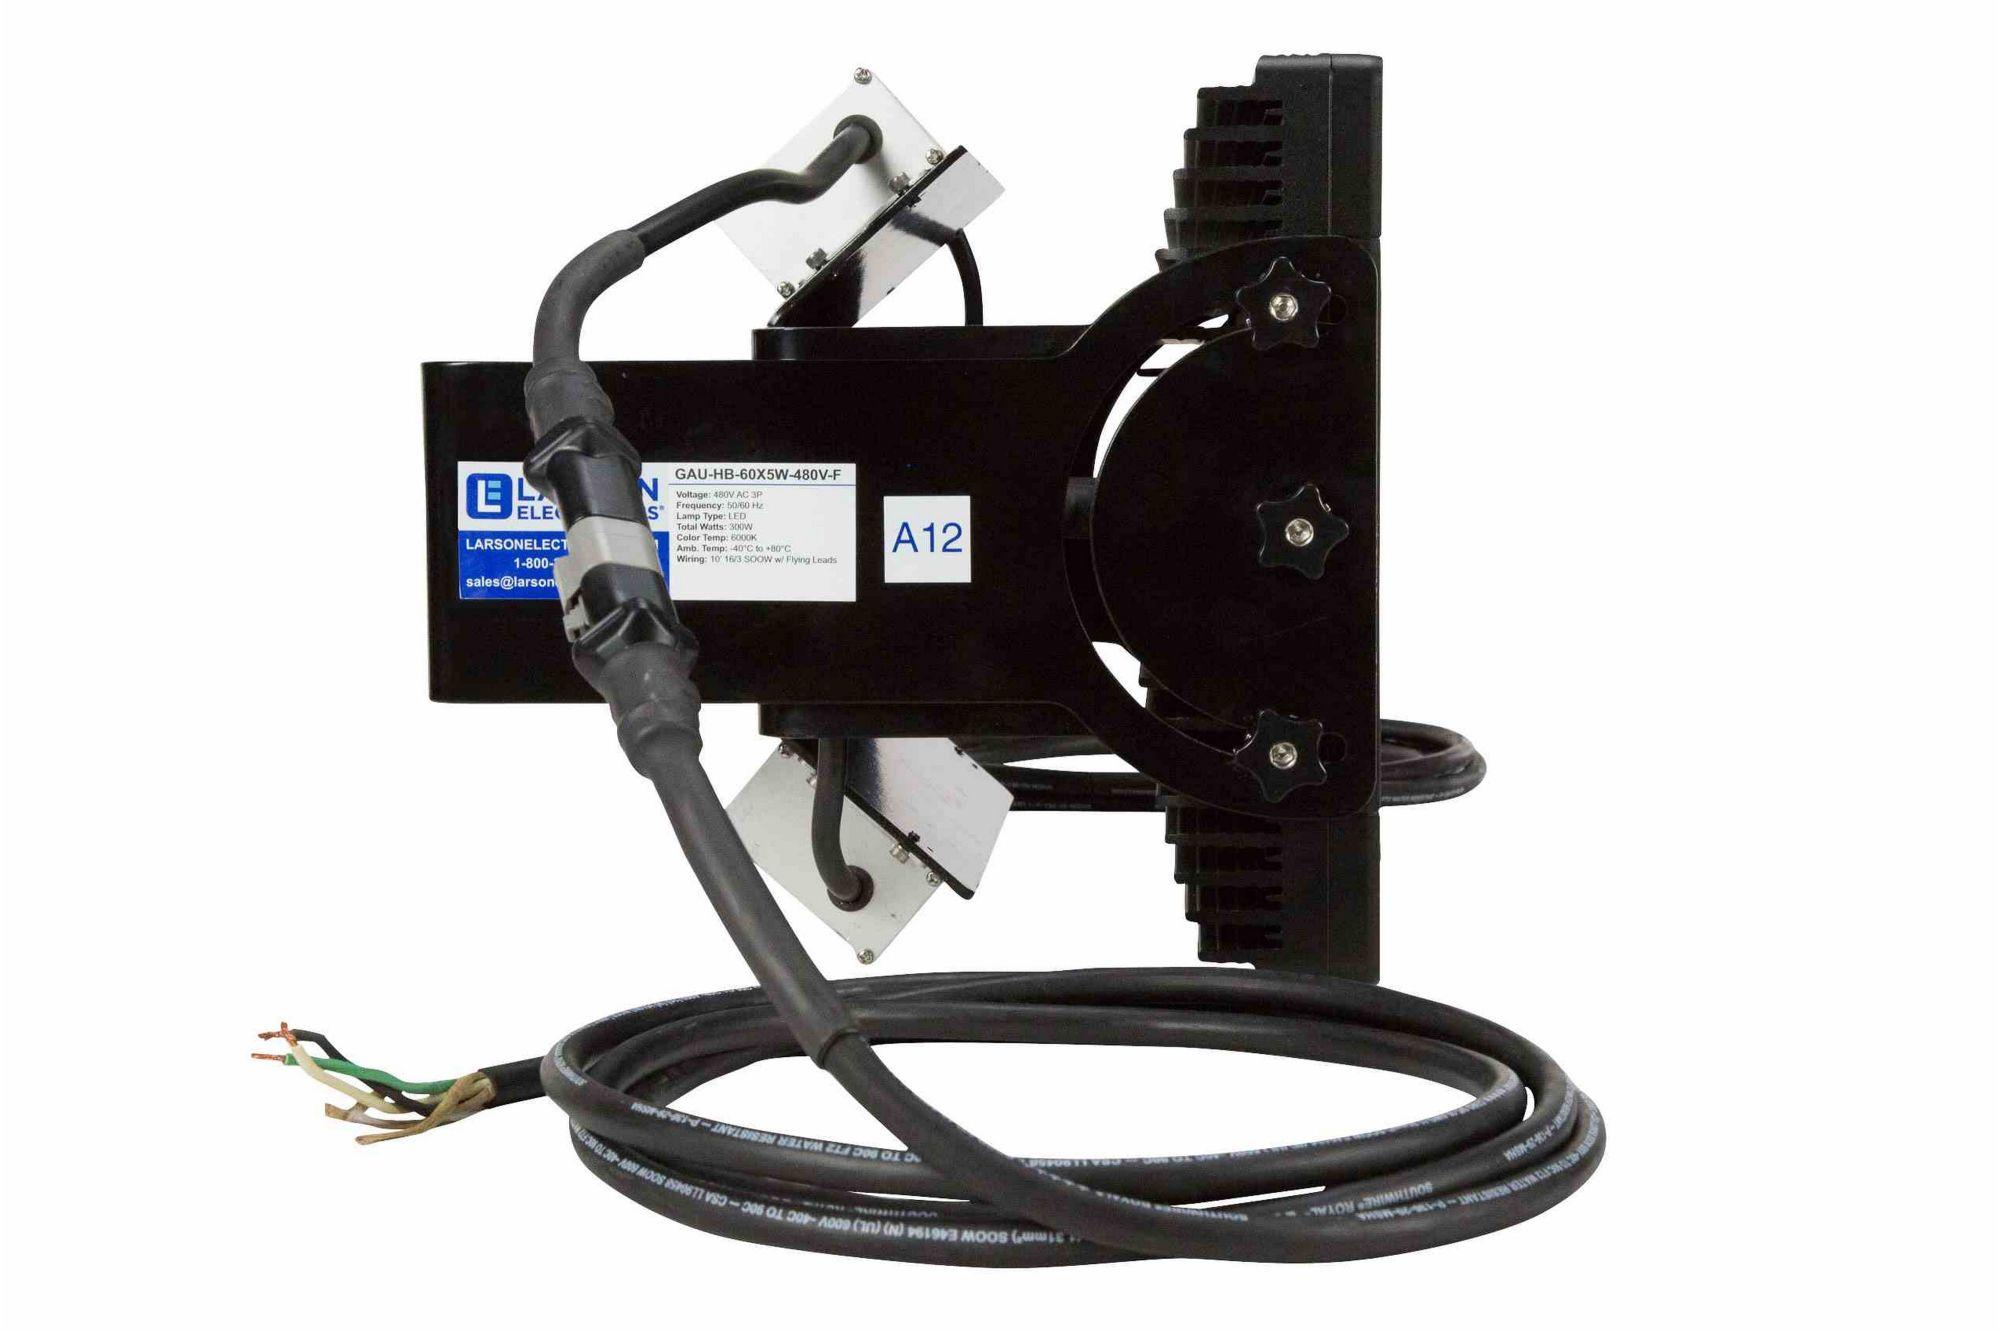 hight resolution of hi res image 4 300 watt led crane rough service fixture back